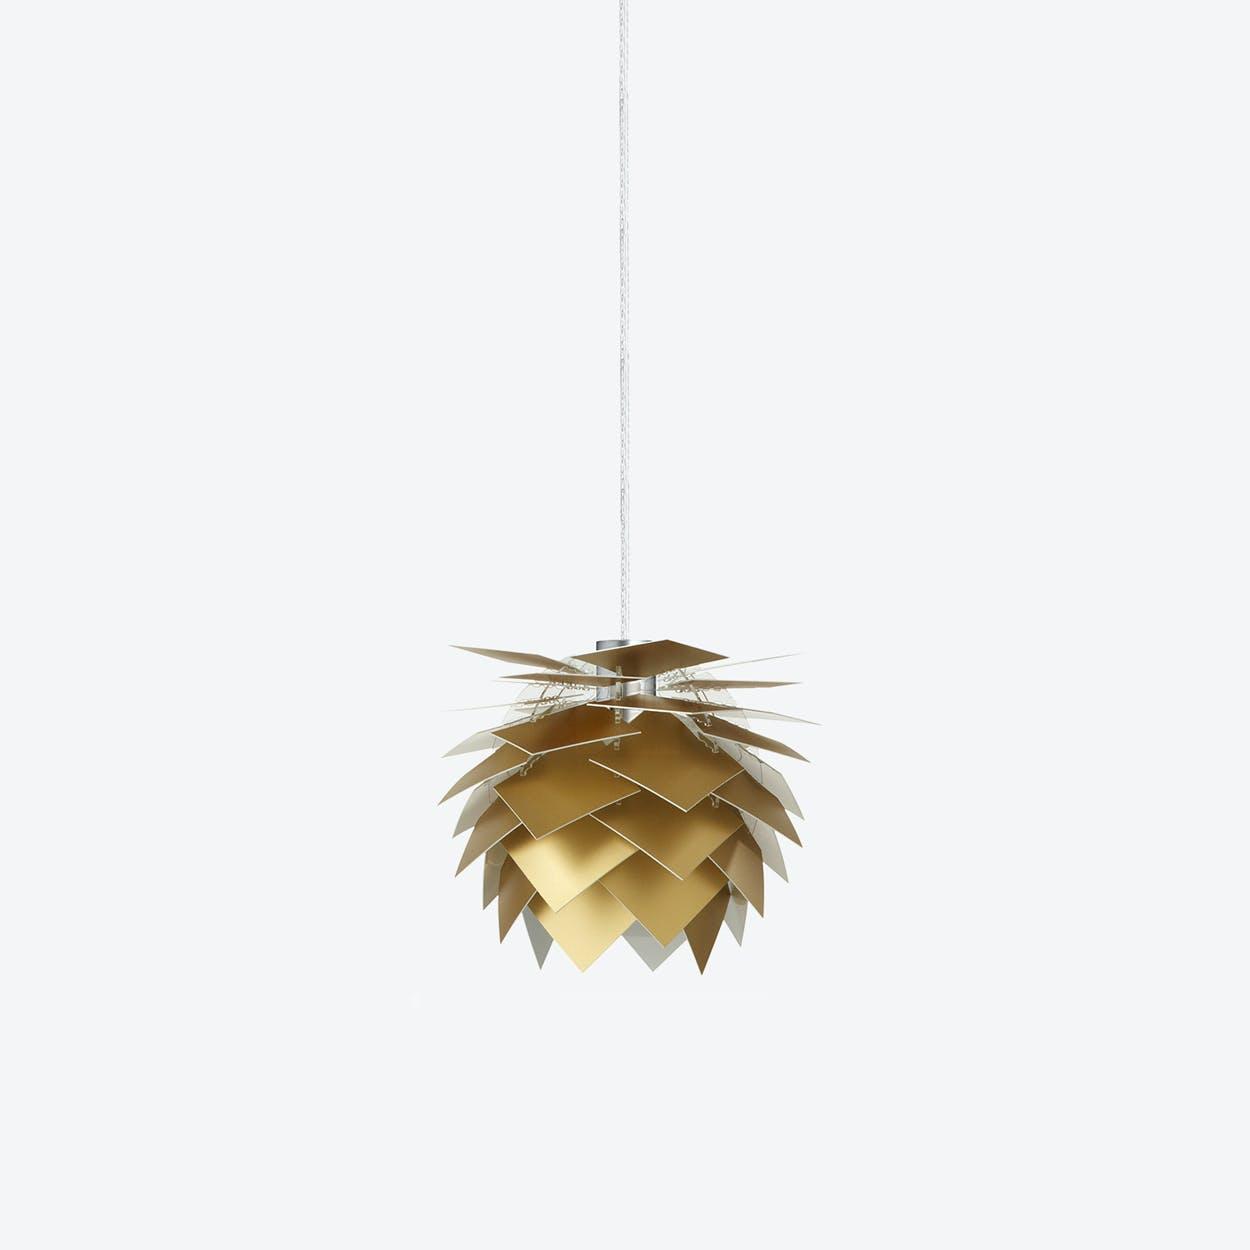 XS PineApple Pendant Lamp in Gold Look